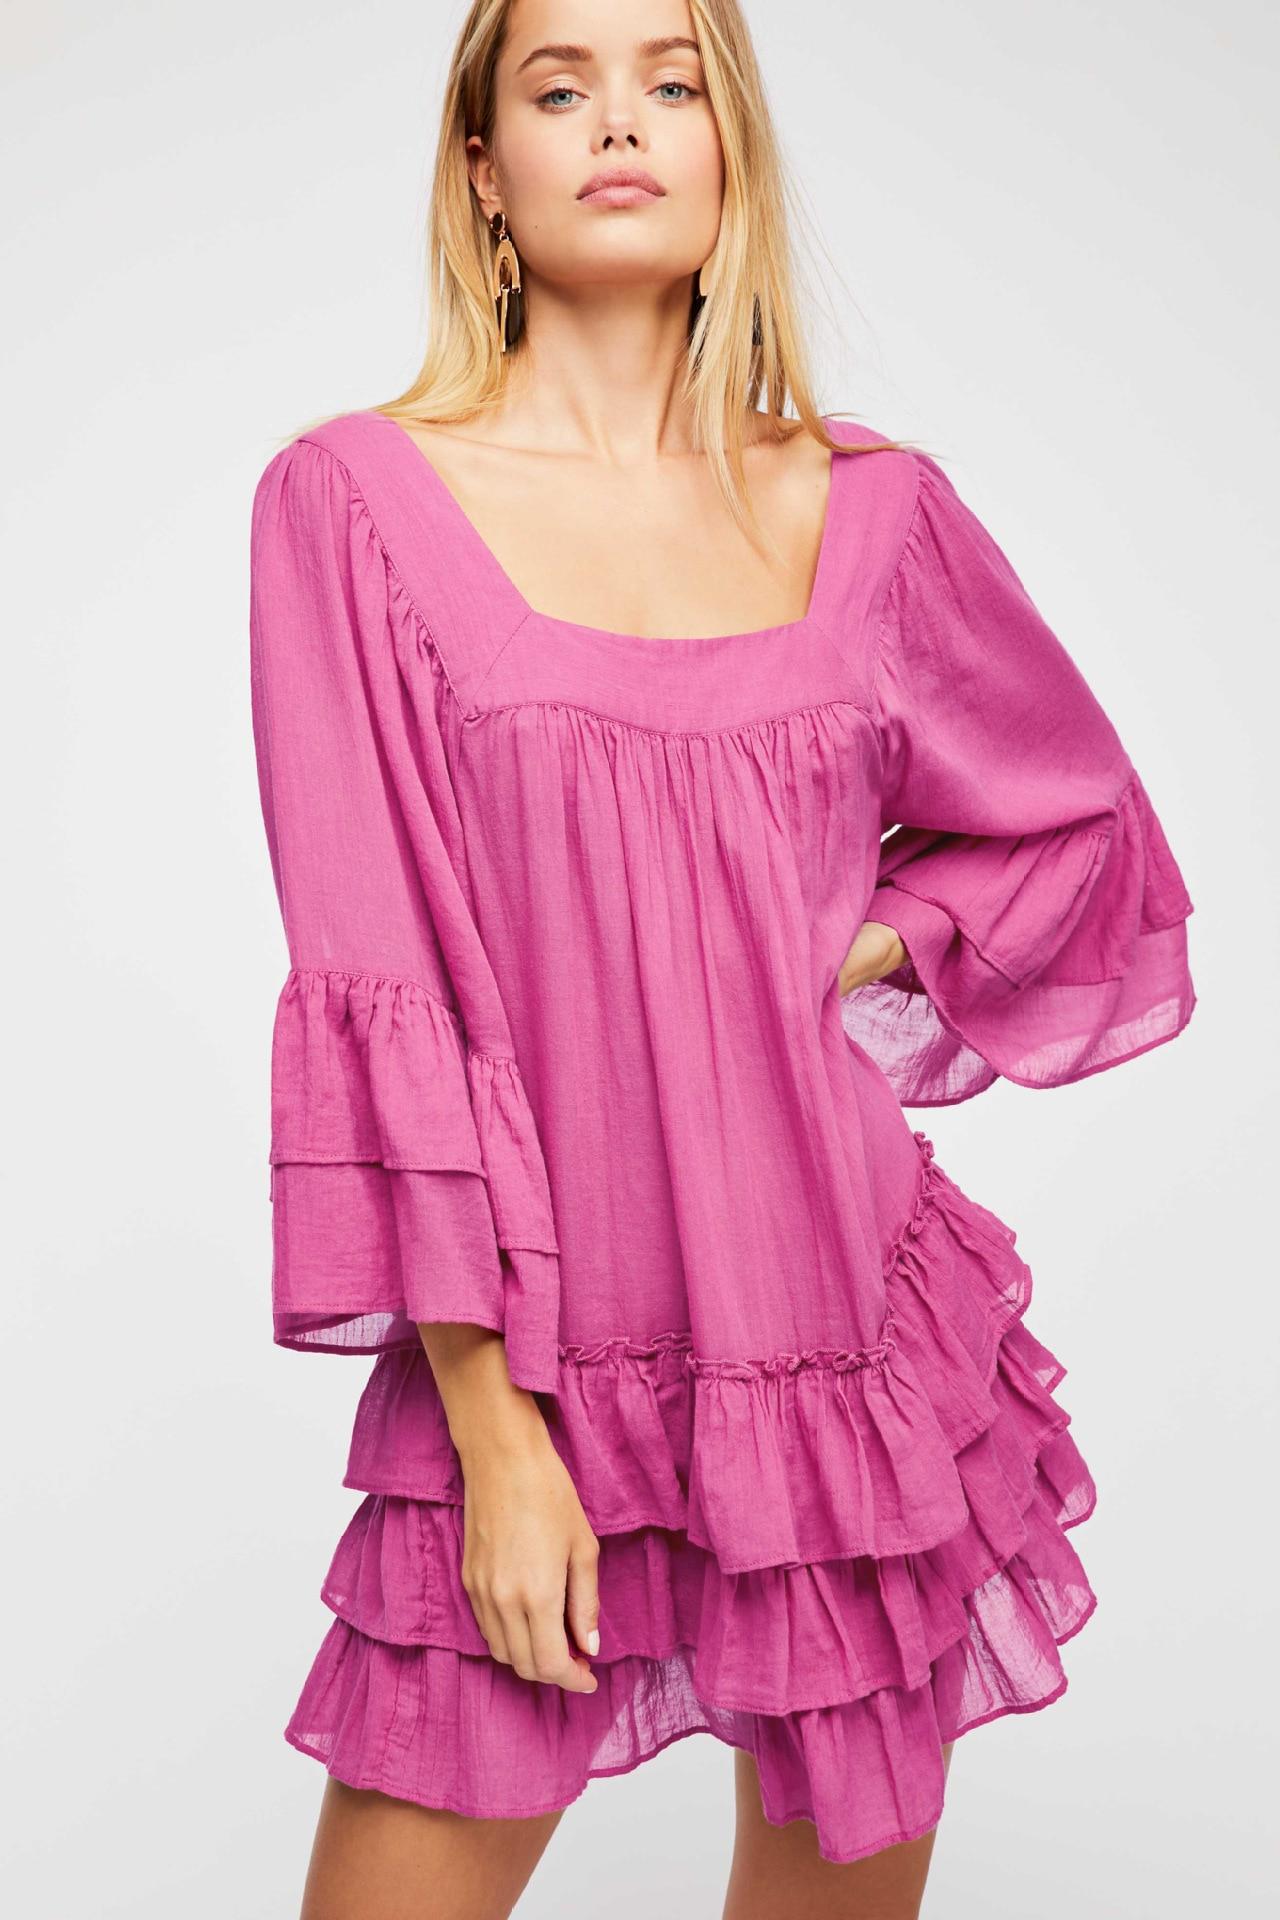 2018 Women's Cotton Dress Square Collar Ruffles Loose Dress Ethnic Holiday Vestidos Flare Sleeve Sexy Mini Dress Boho Robes